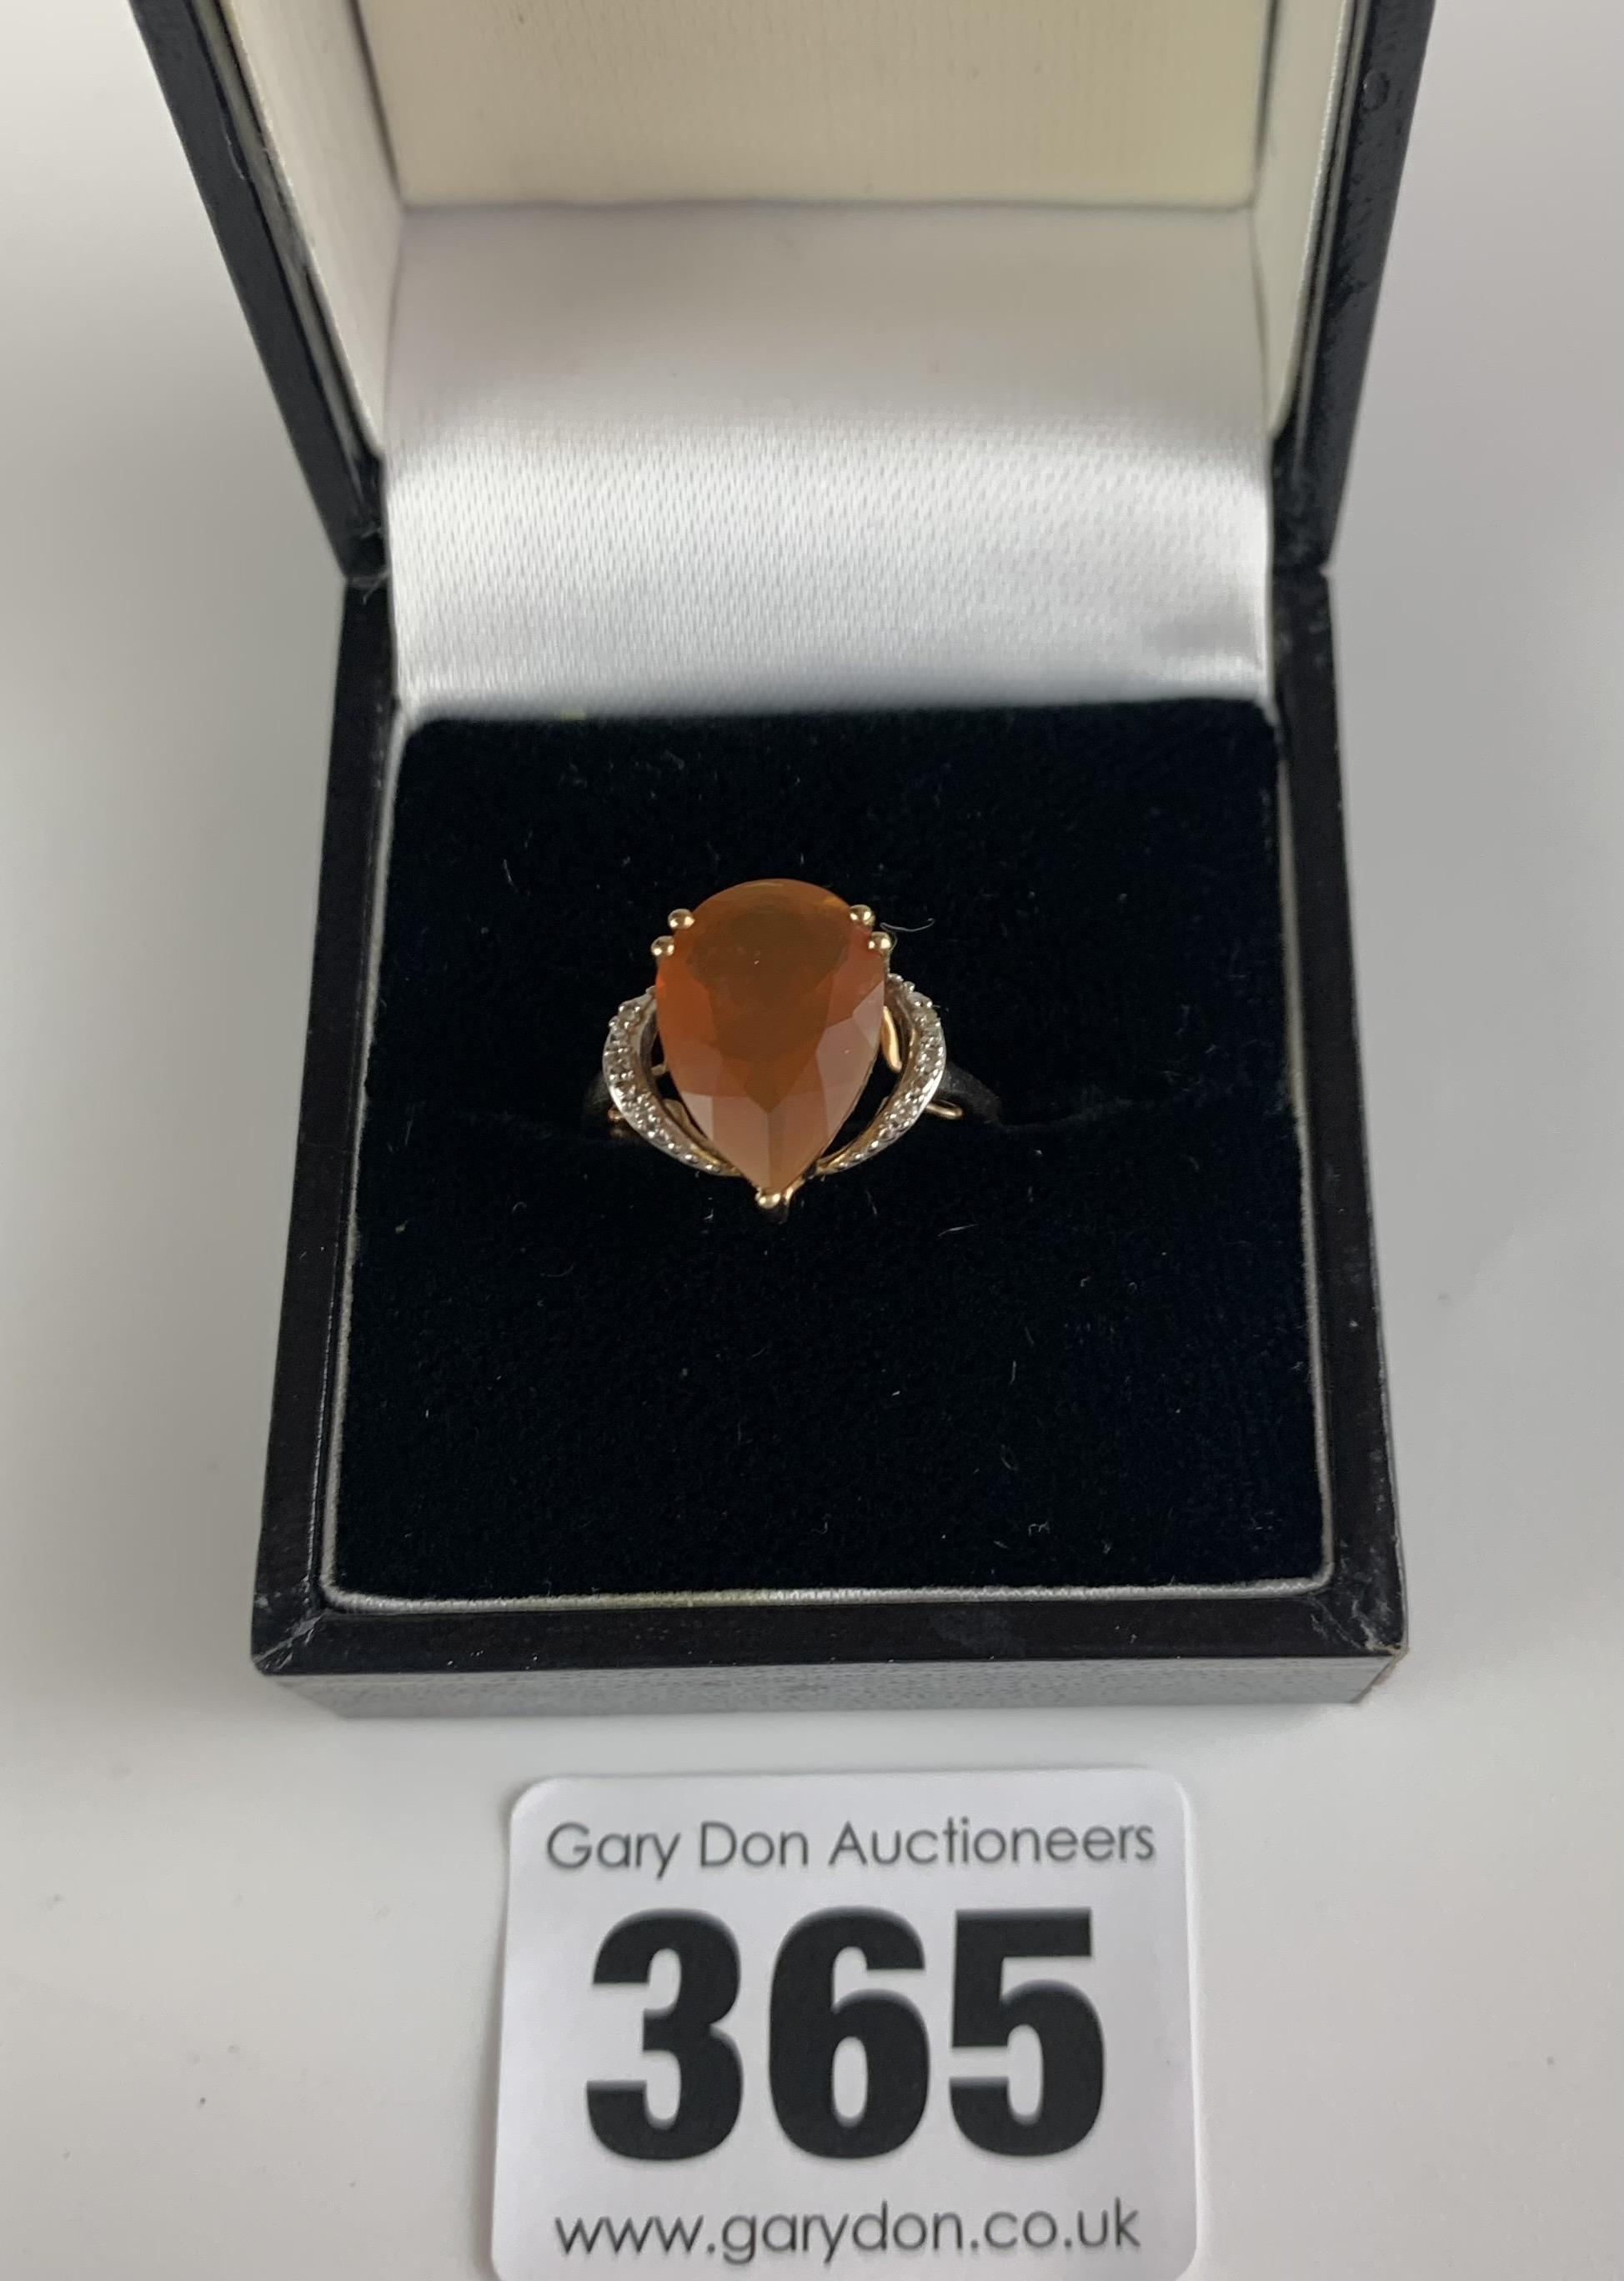 10k gold ring with heart shaped orange stone, size J/K, w: 2.1 gms